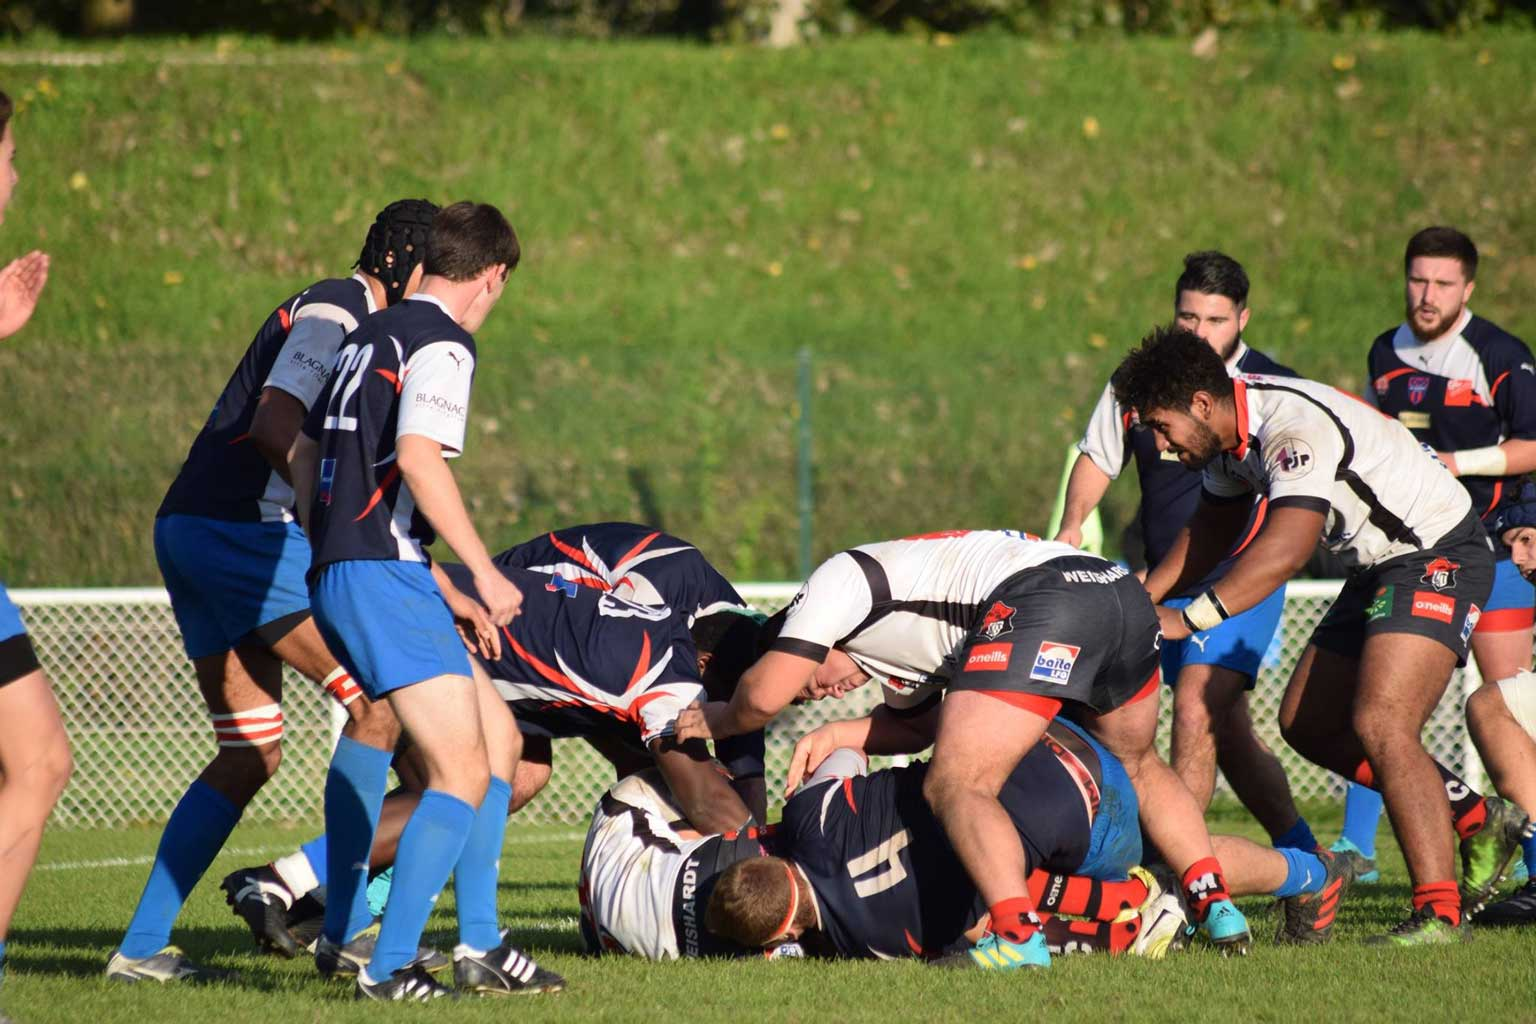 © 2018 Maeva Franco - Espoirs - Blagnac vs Graulhet - Photo 77